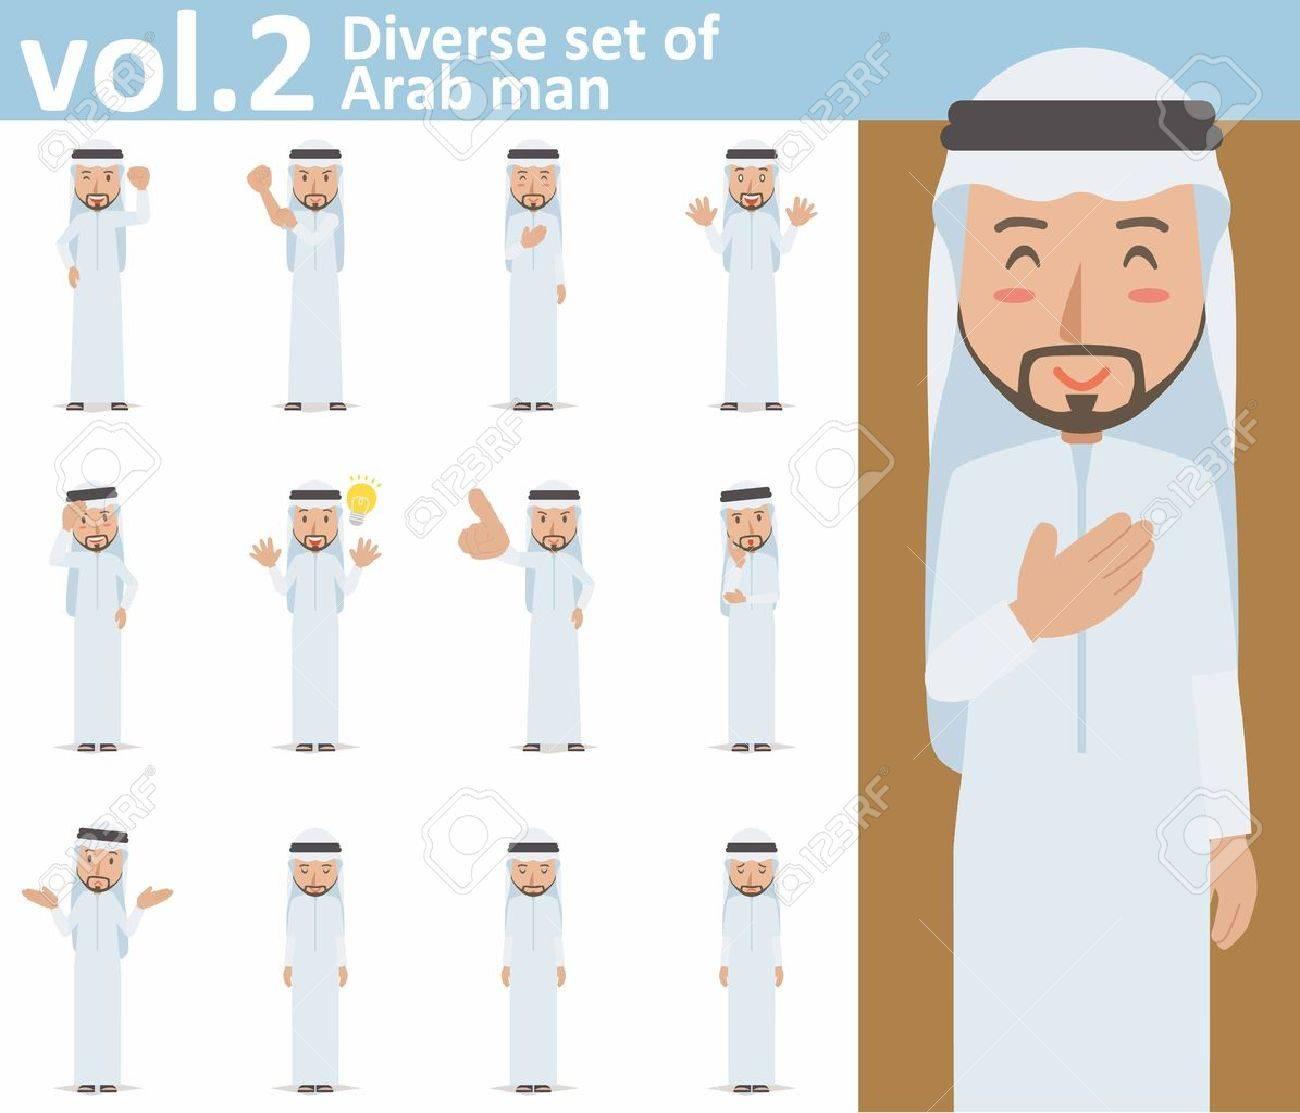 diverse set of Arab man on white background - 62103263